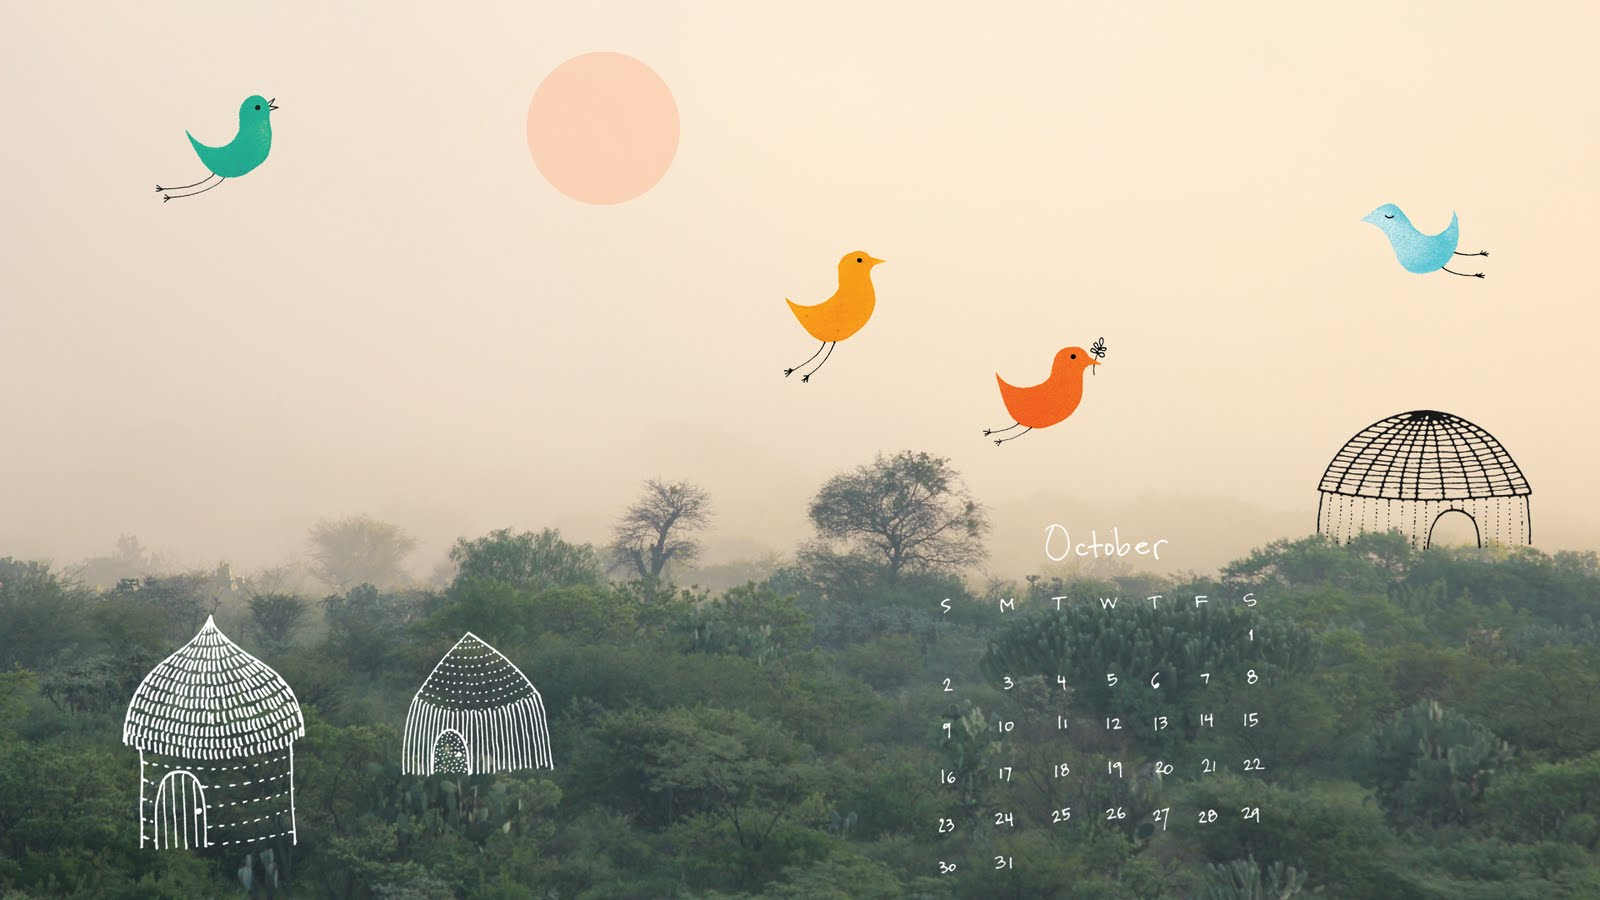 Wallpaper Calendar Oct : Oct desktop new free calendar for october at